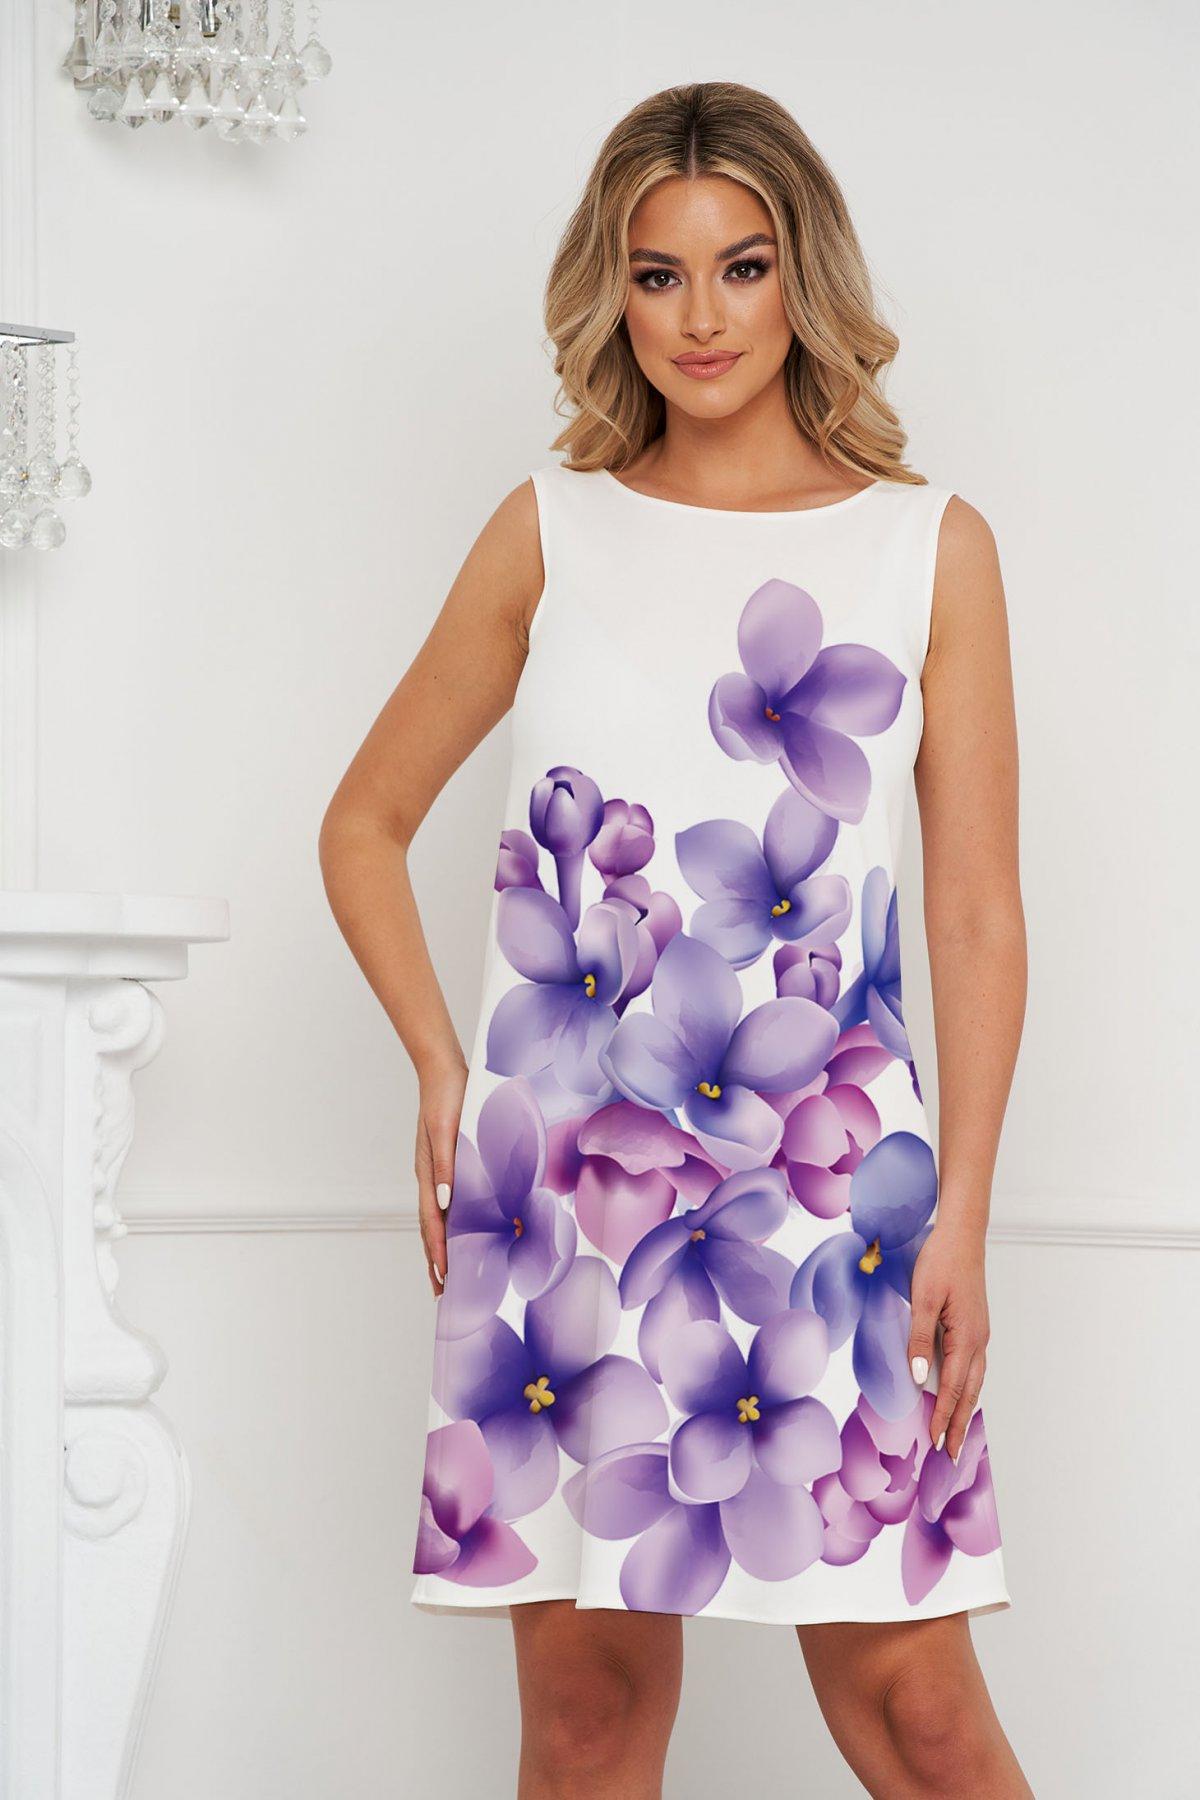 Rochie StarShinerS scurta cu croi larg din material elastic cu imprimeuri florale unice